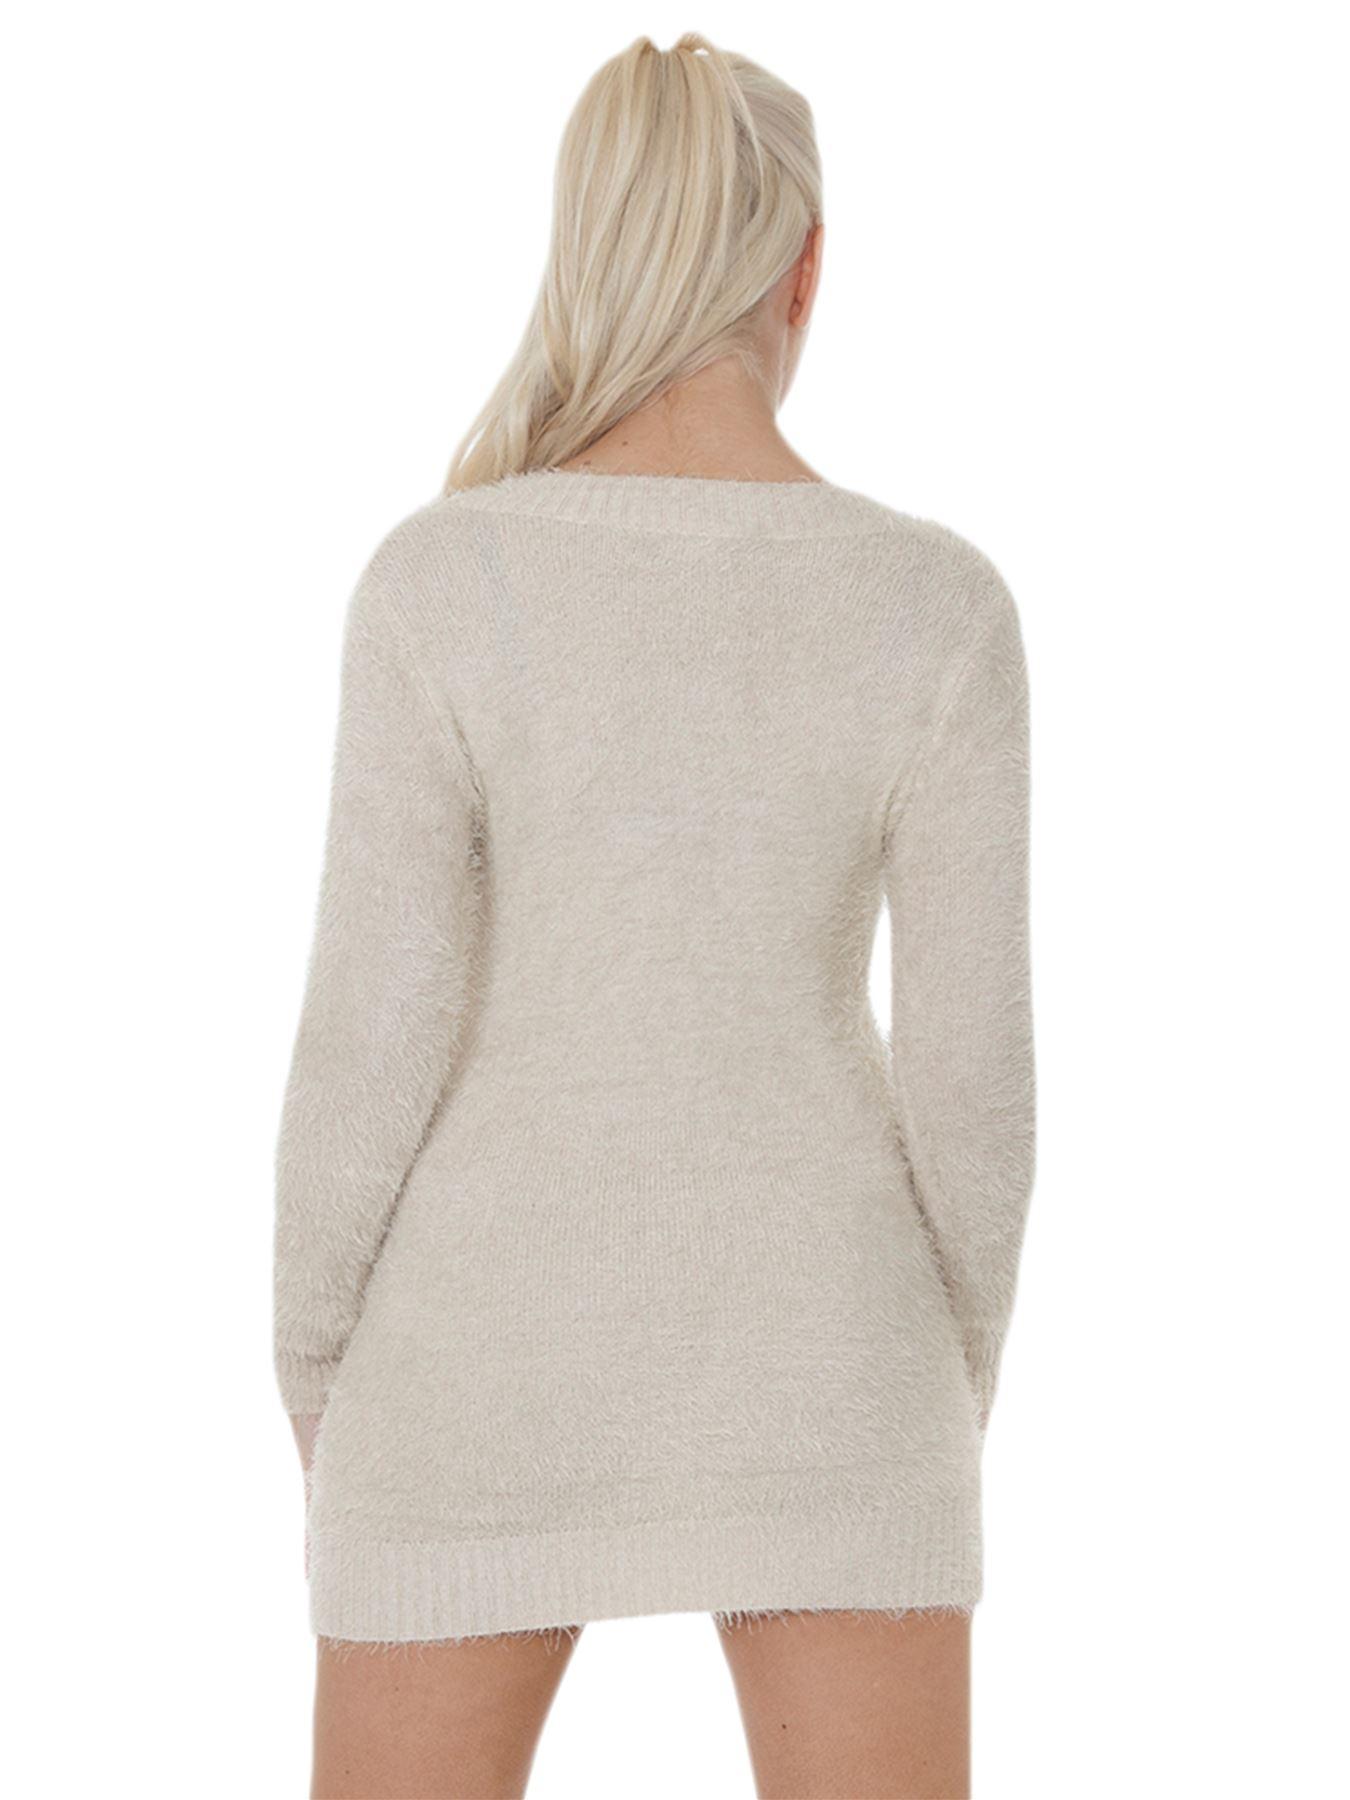 Pull-Femme-Femmes-Tricote-Cardigans-Plain-Tricot-Moelleux-Col-V-Manches-Longues miniature 6